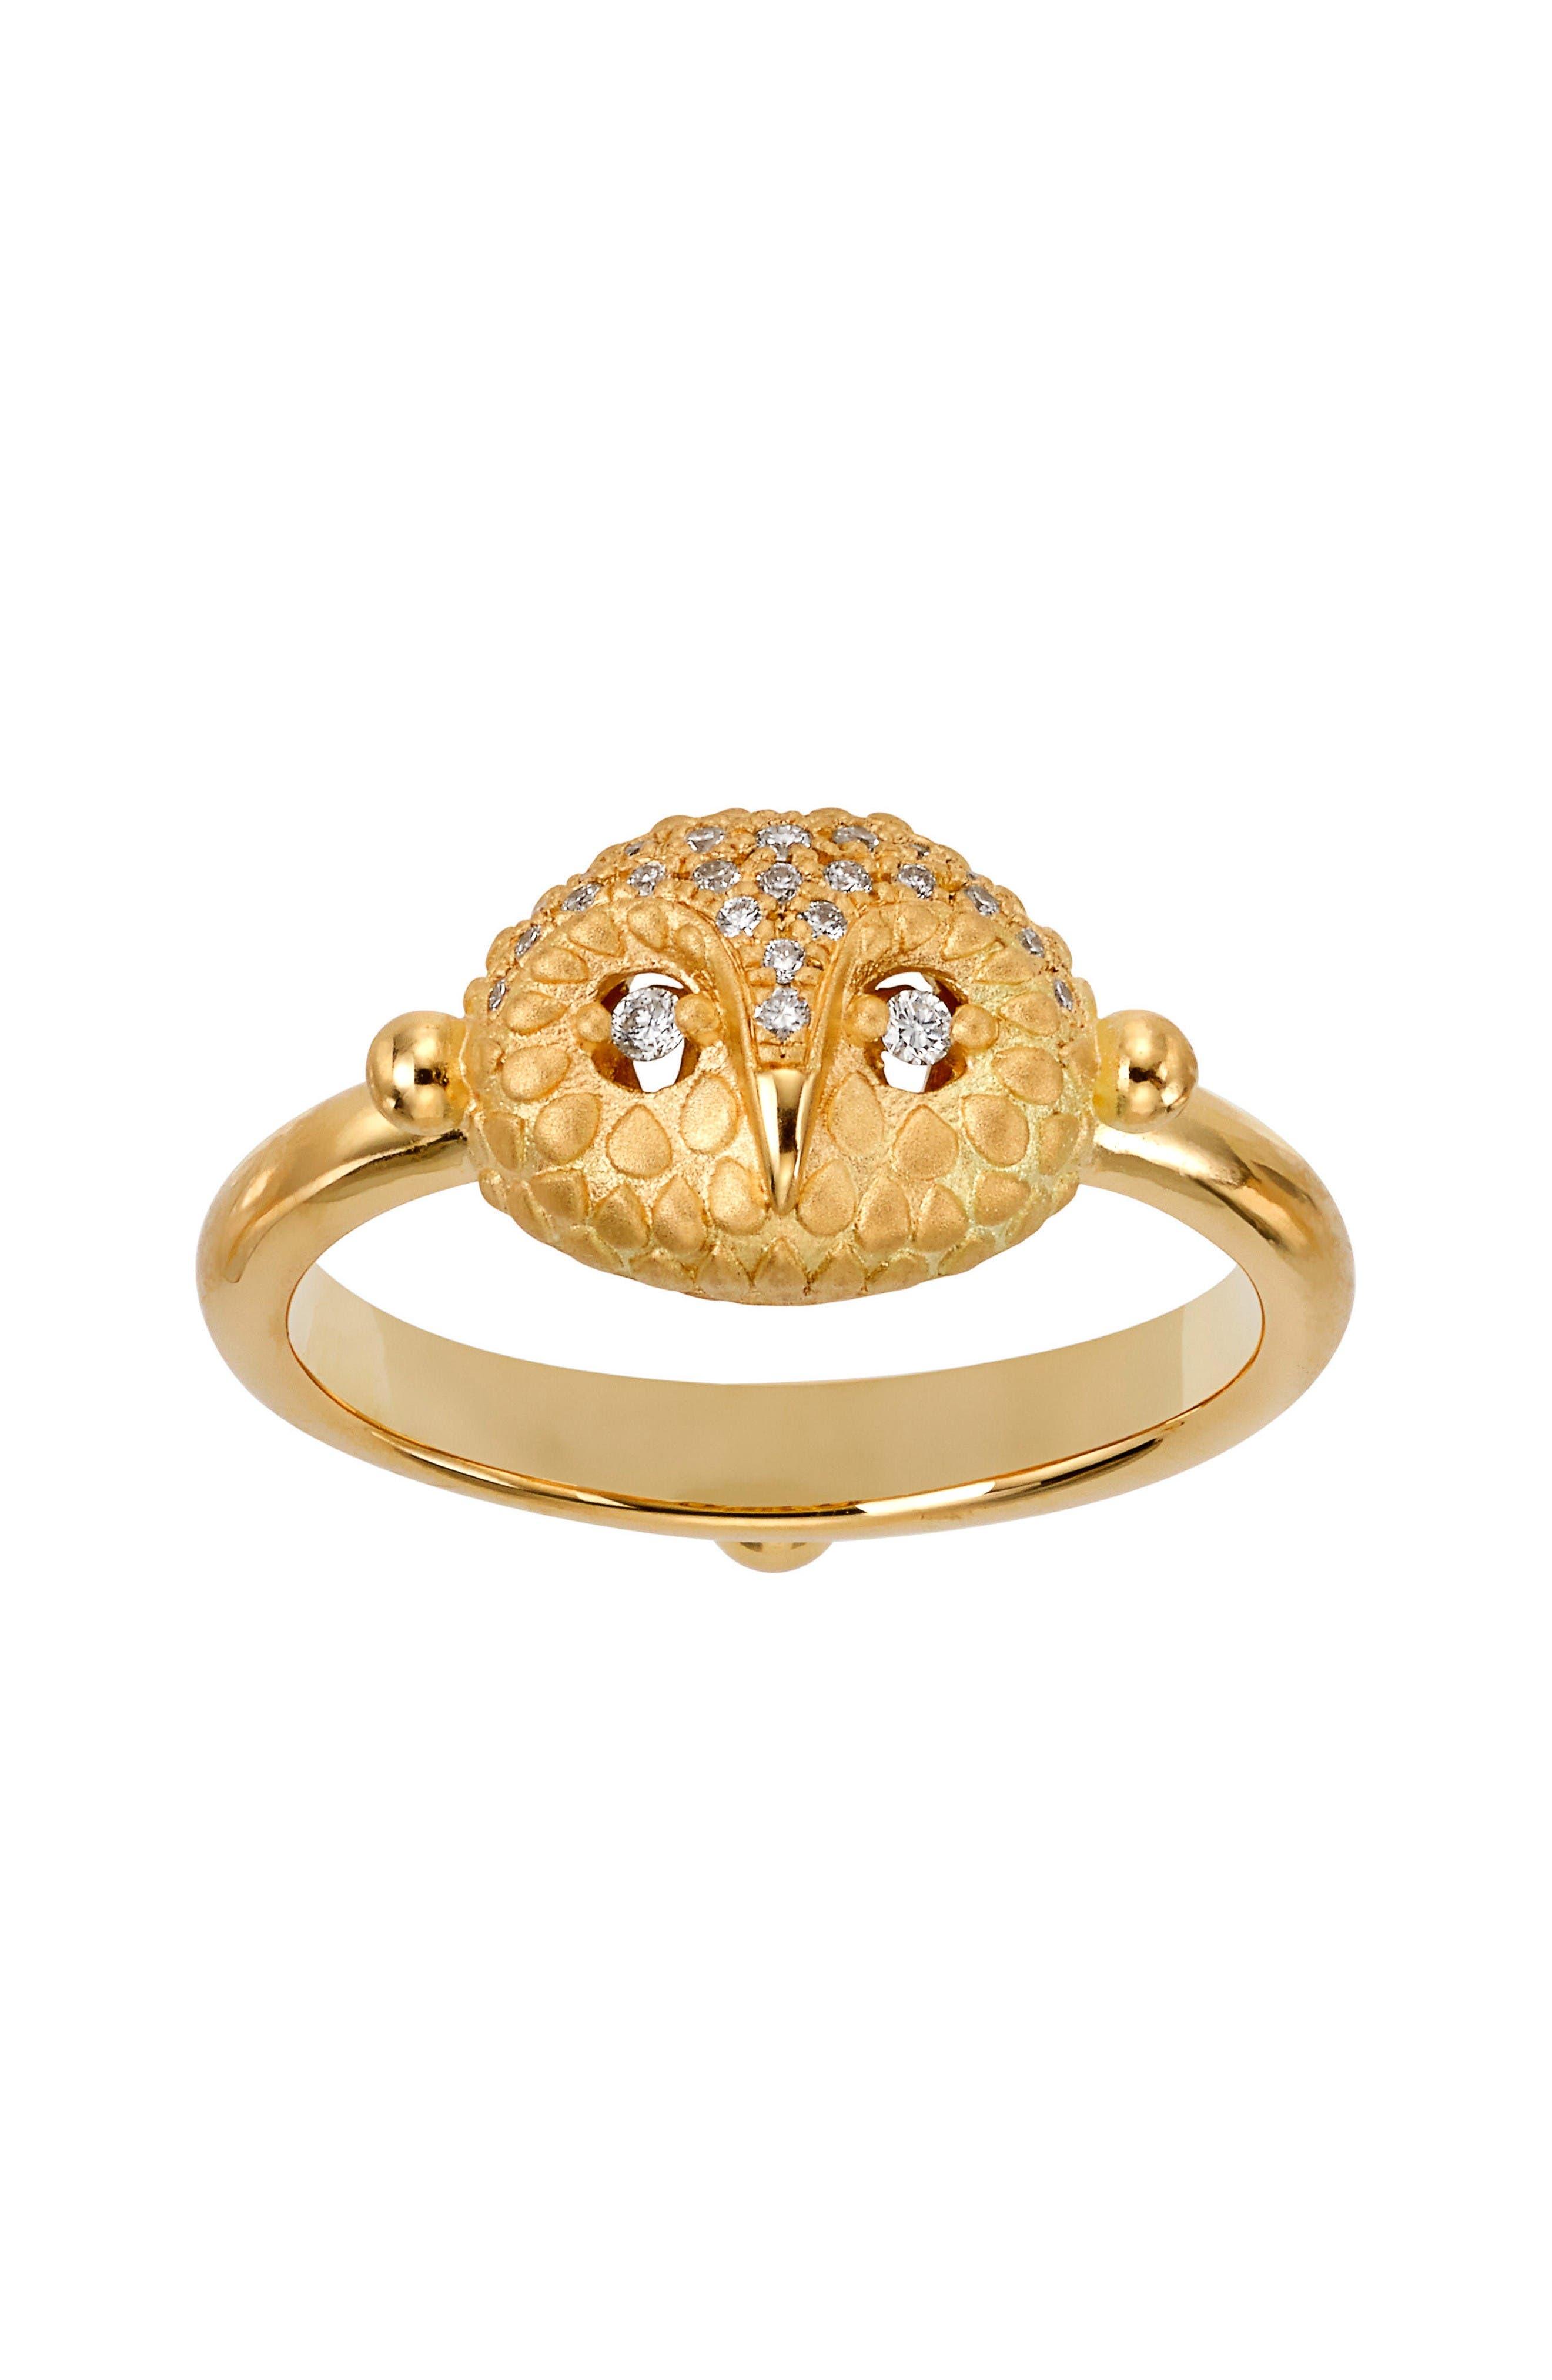 Main Image - Temple St. Clair Diamond Owl Ring